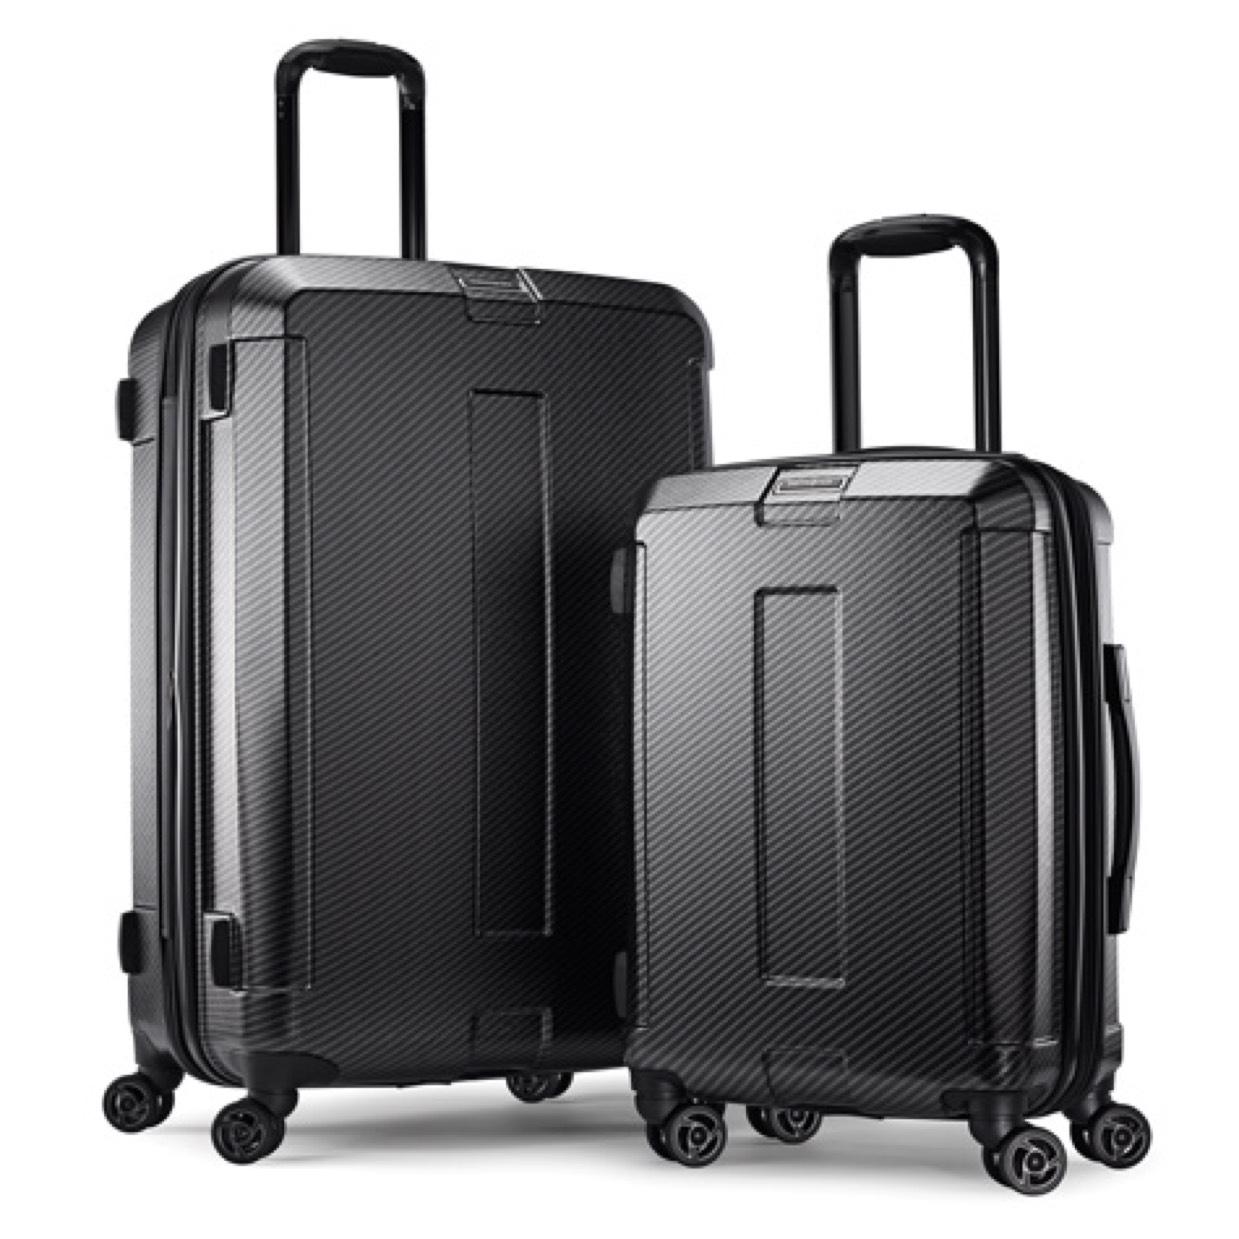 Samsonite Carbon Elite 2 Piece Luggage @ Costco online offer -  £148.99 (inc VAT)